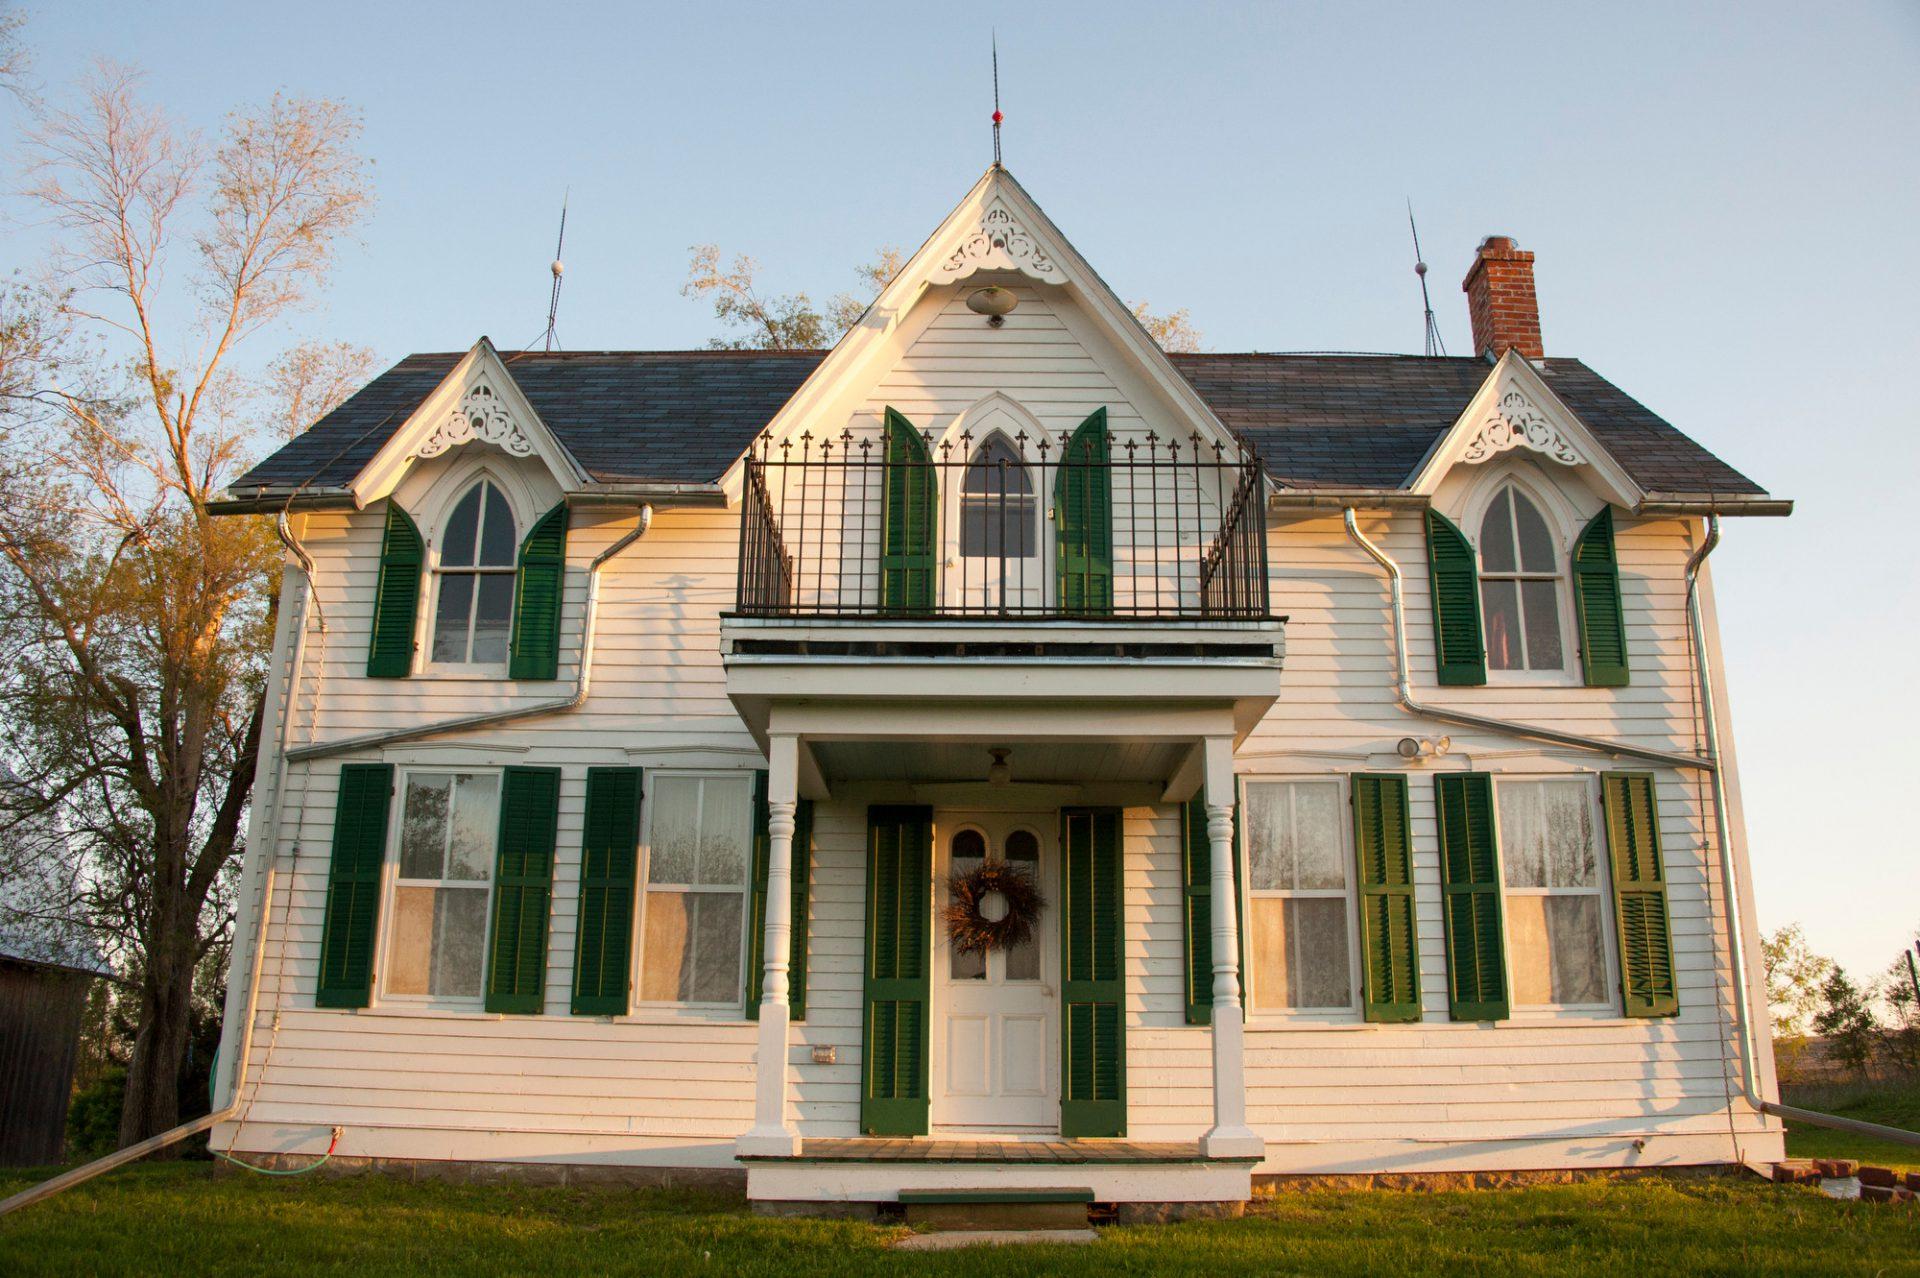 Photo: An old farm house in Dunbar, Nebraska.